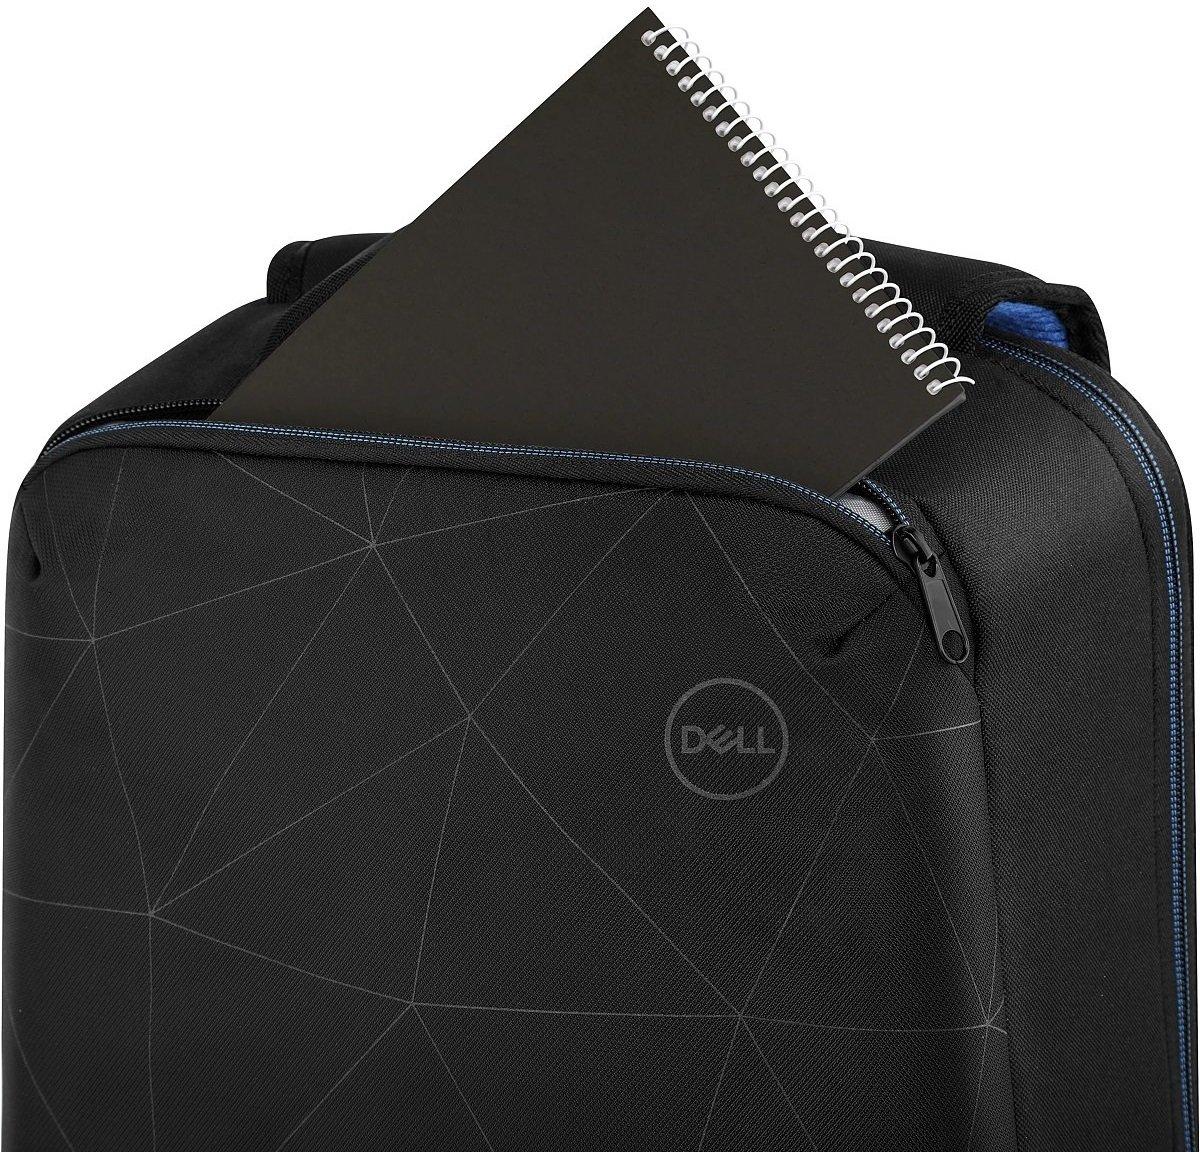 "Рюкзак Dell Essential Backpack ES1520P 15.6"" фото8"